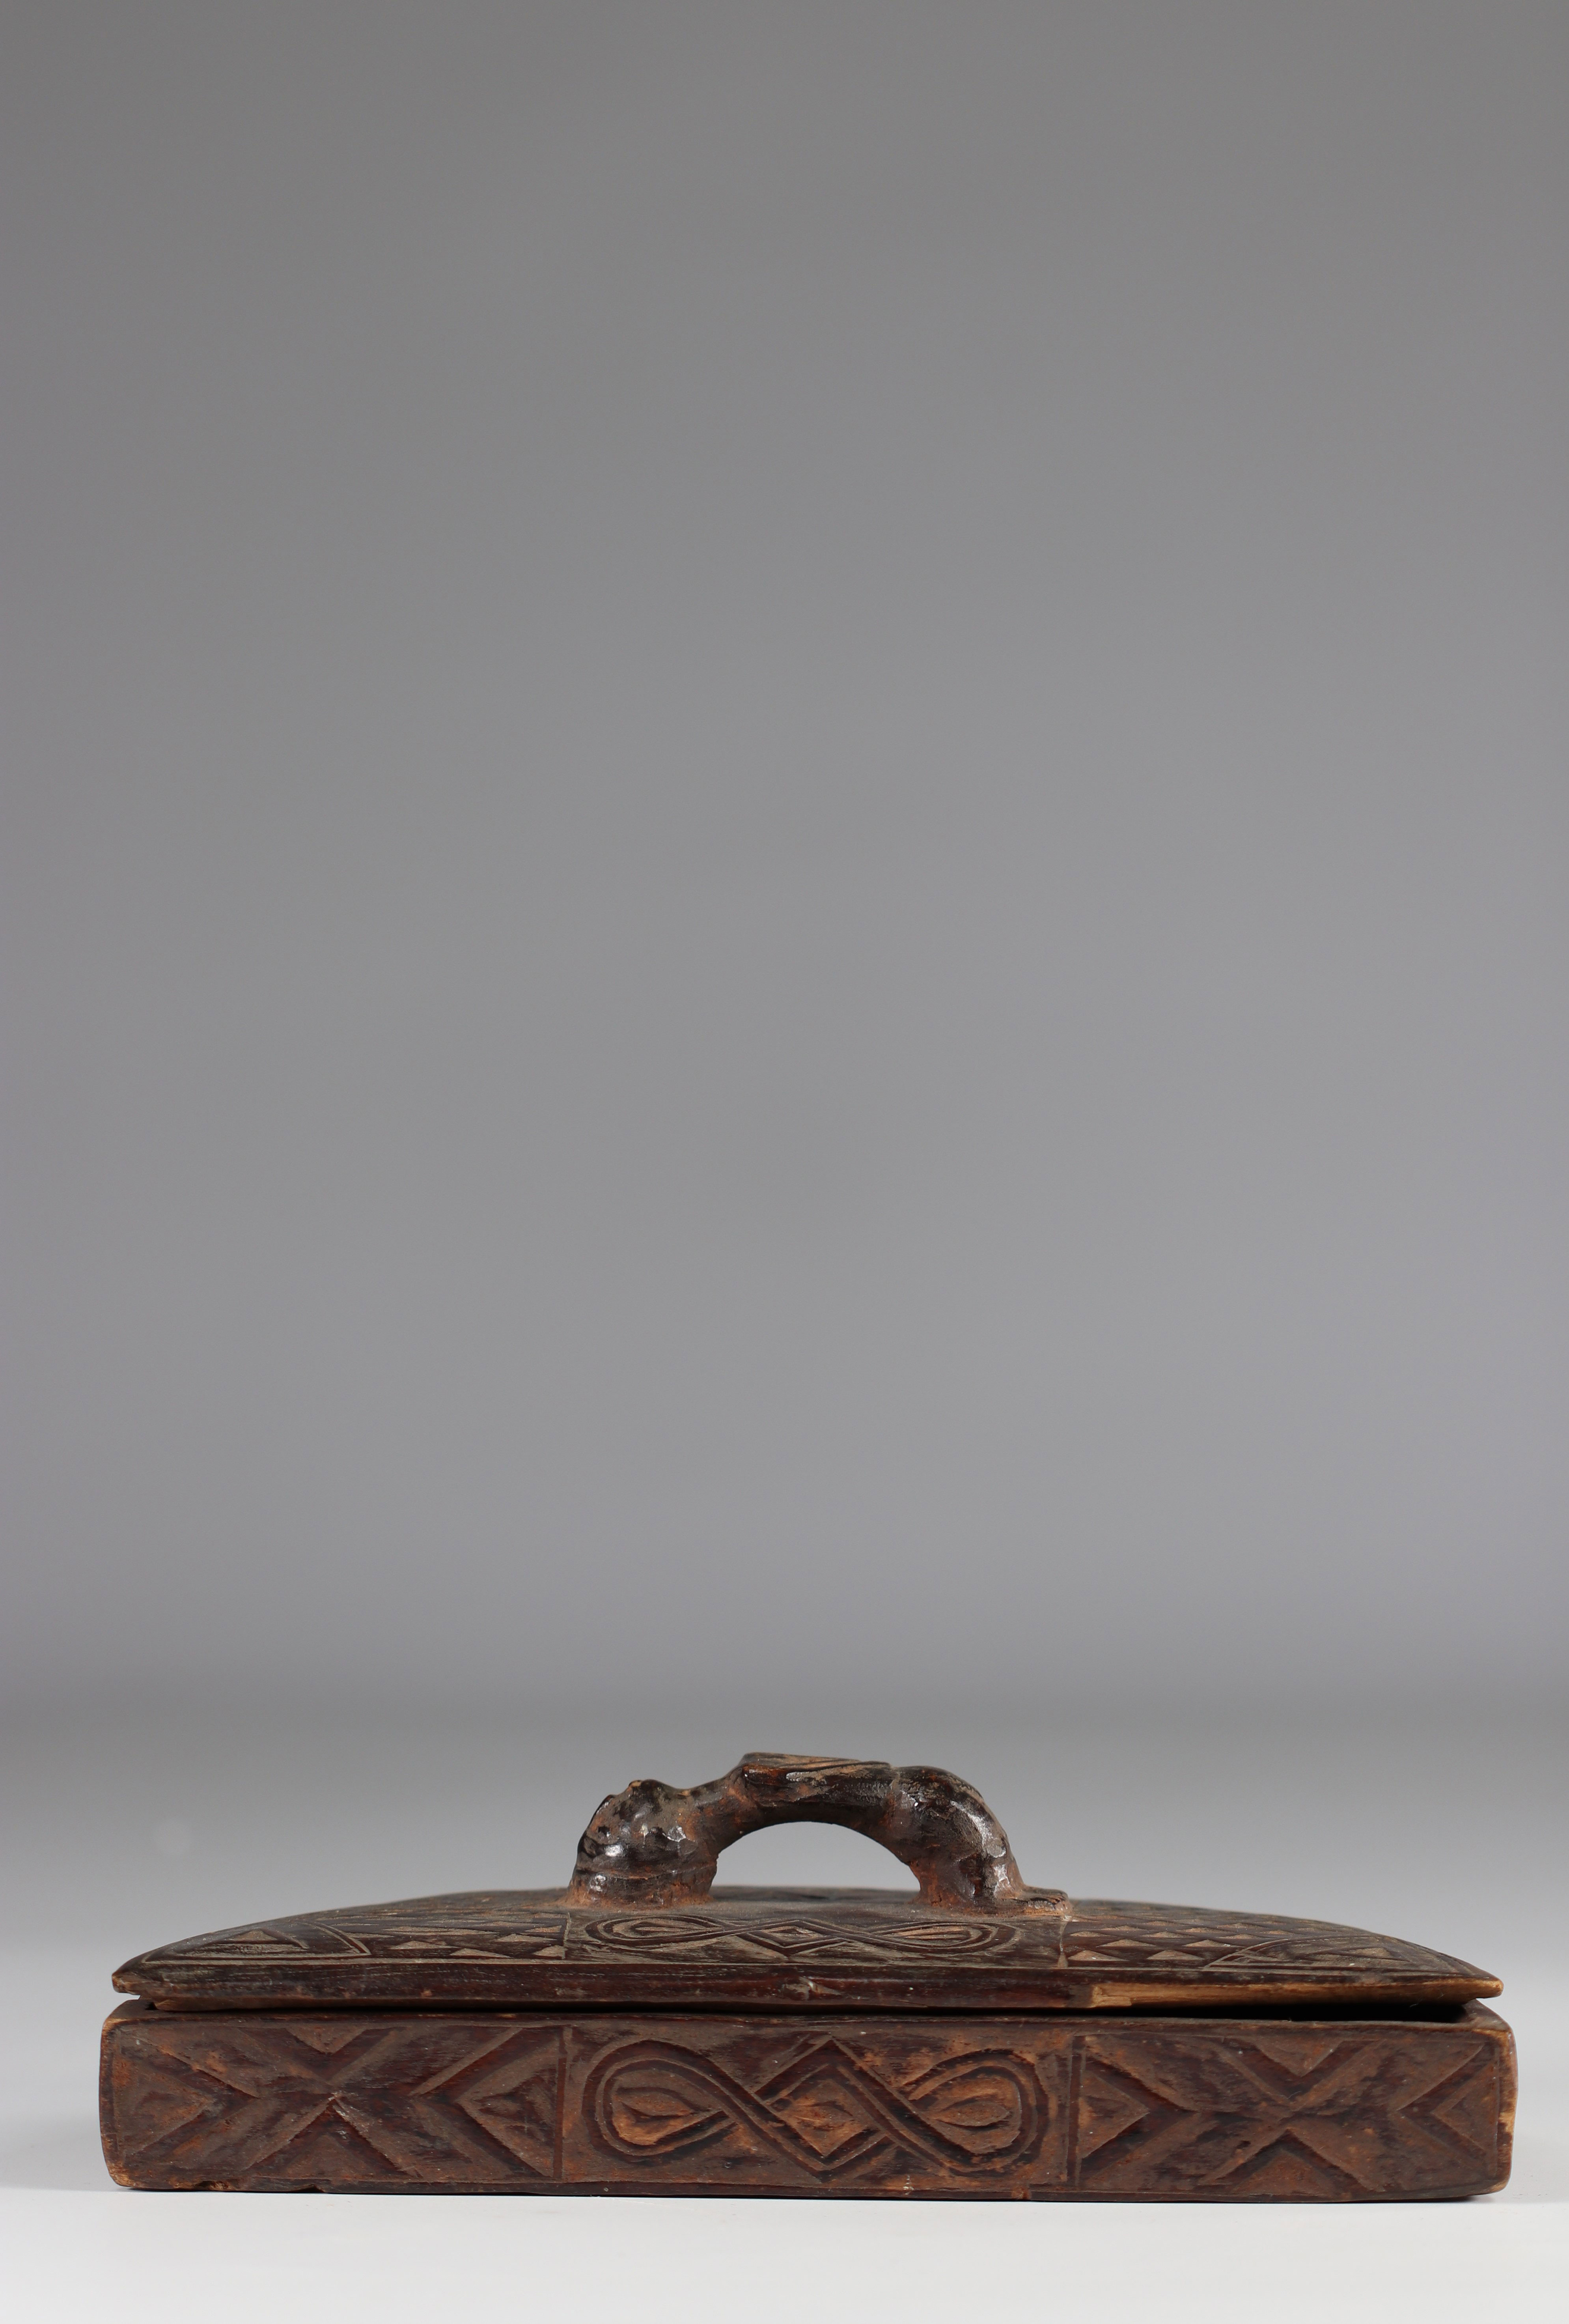 Beautiful Kuba tukula box - beautiful patina of use - early 20th century old P.d'Artevelle collectio - Image 3 of 3